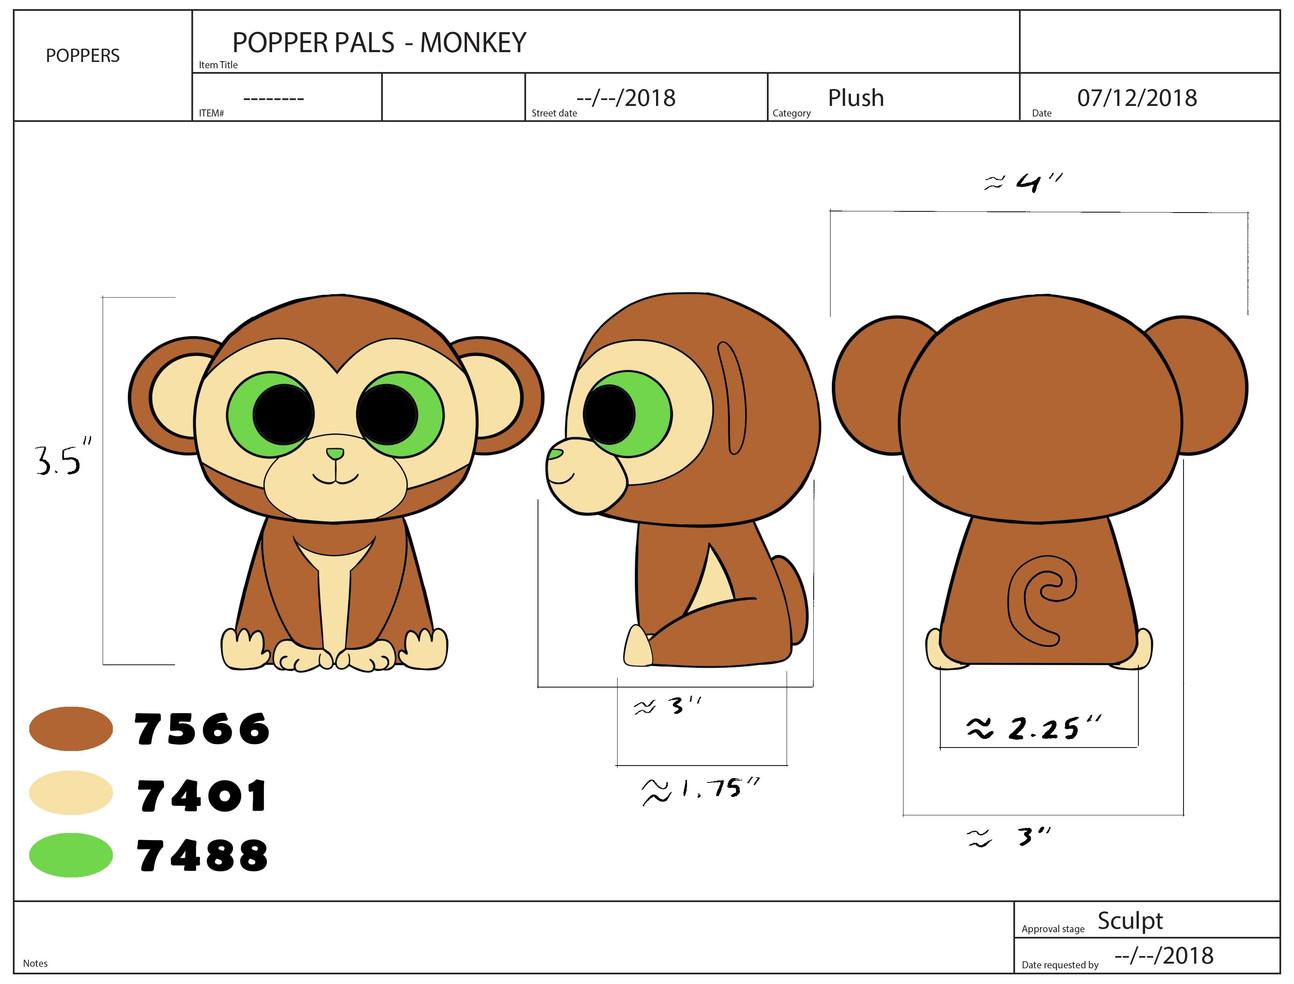 Popper Pals Monkey Product Sheet